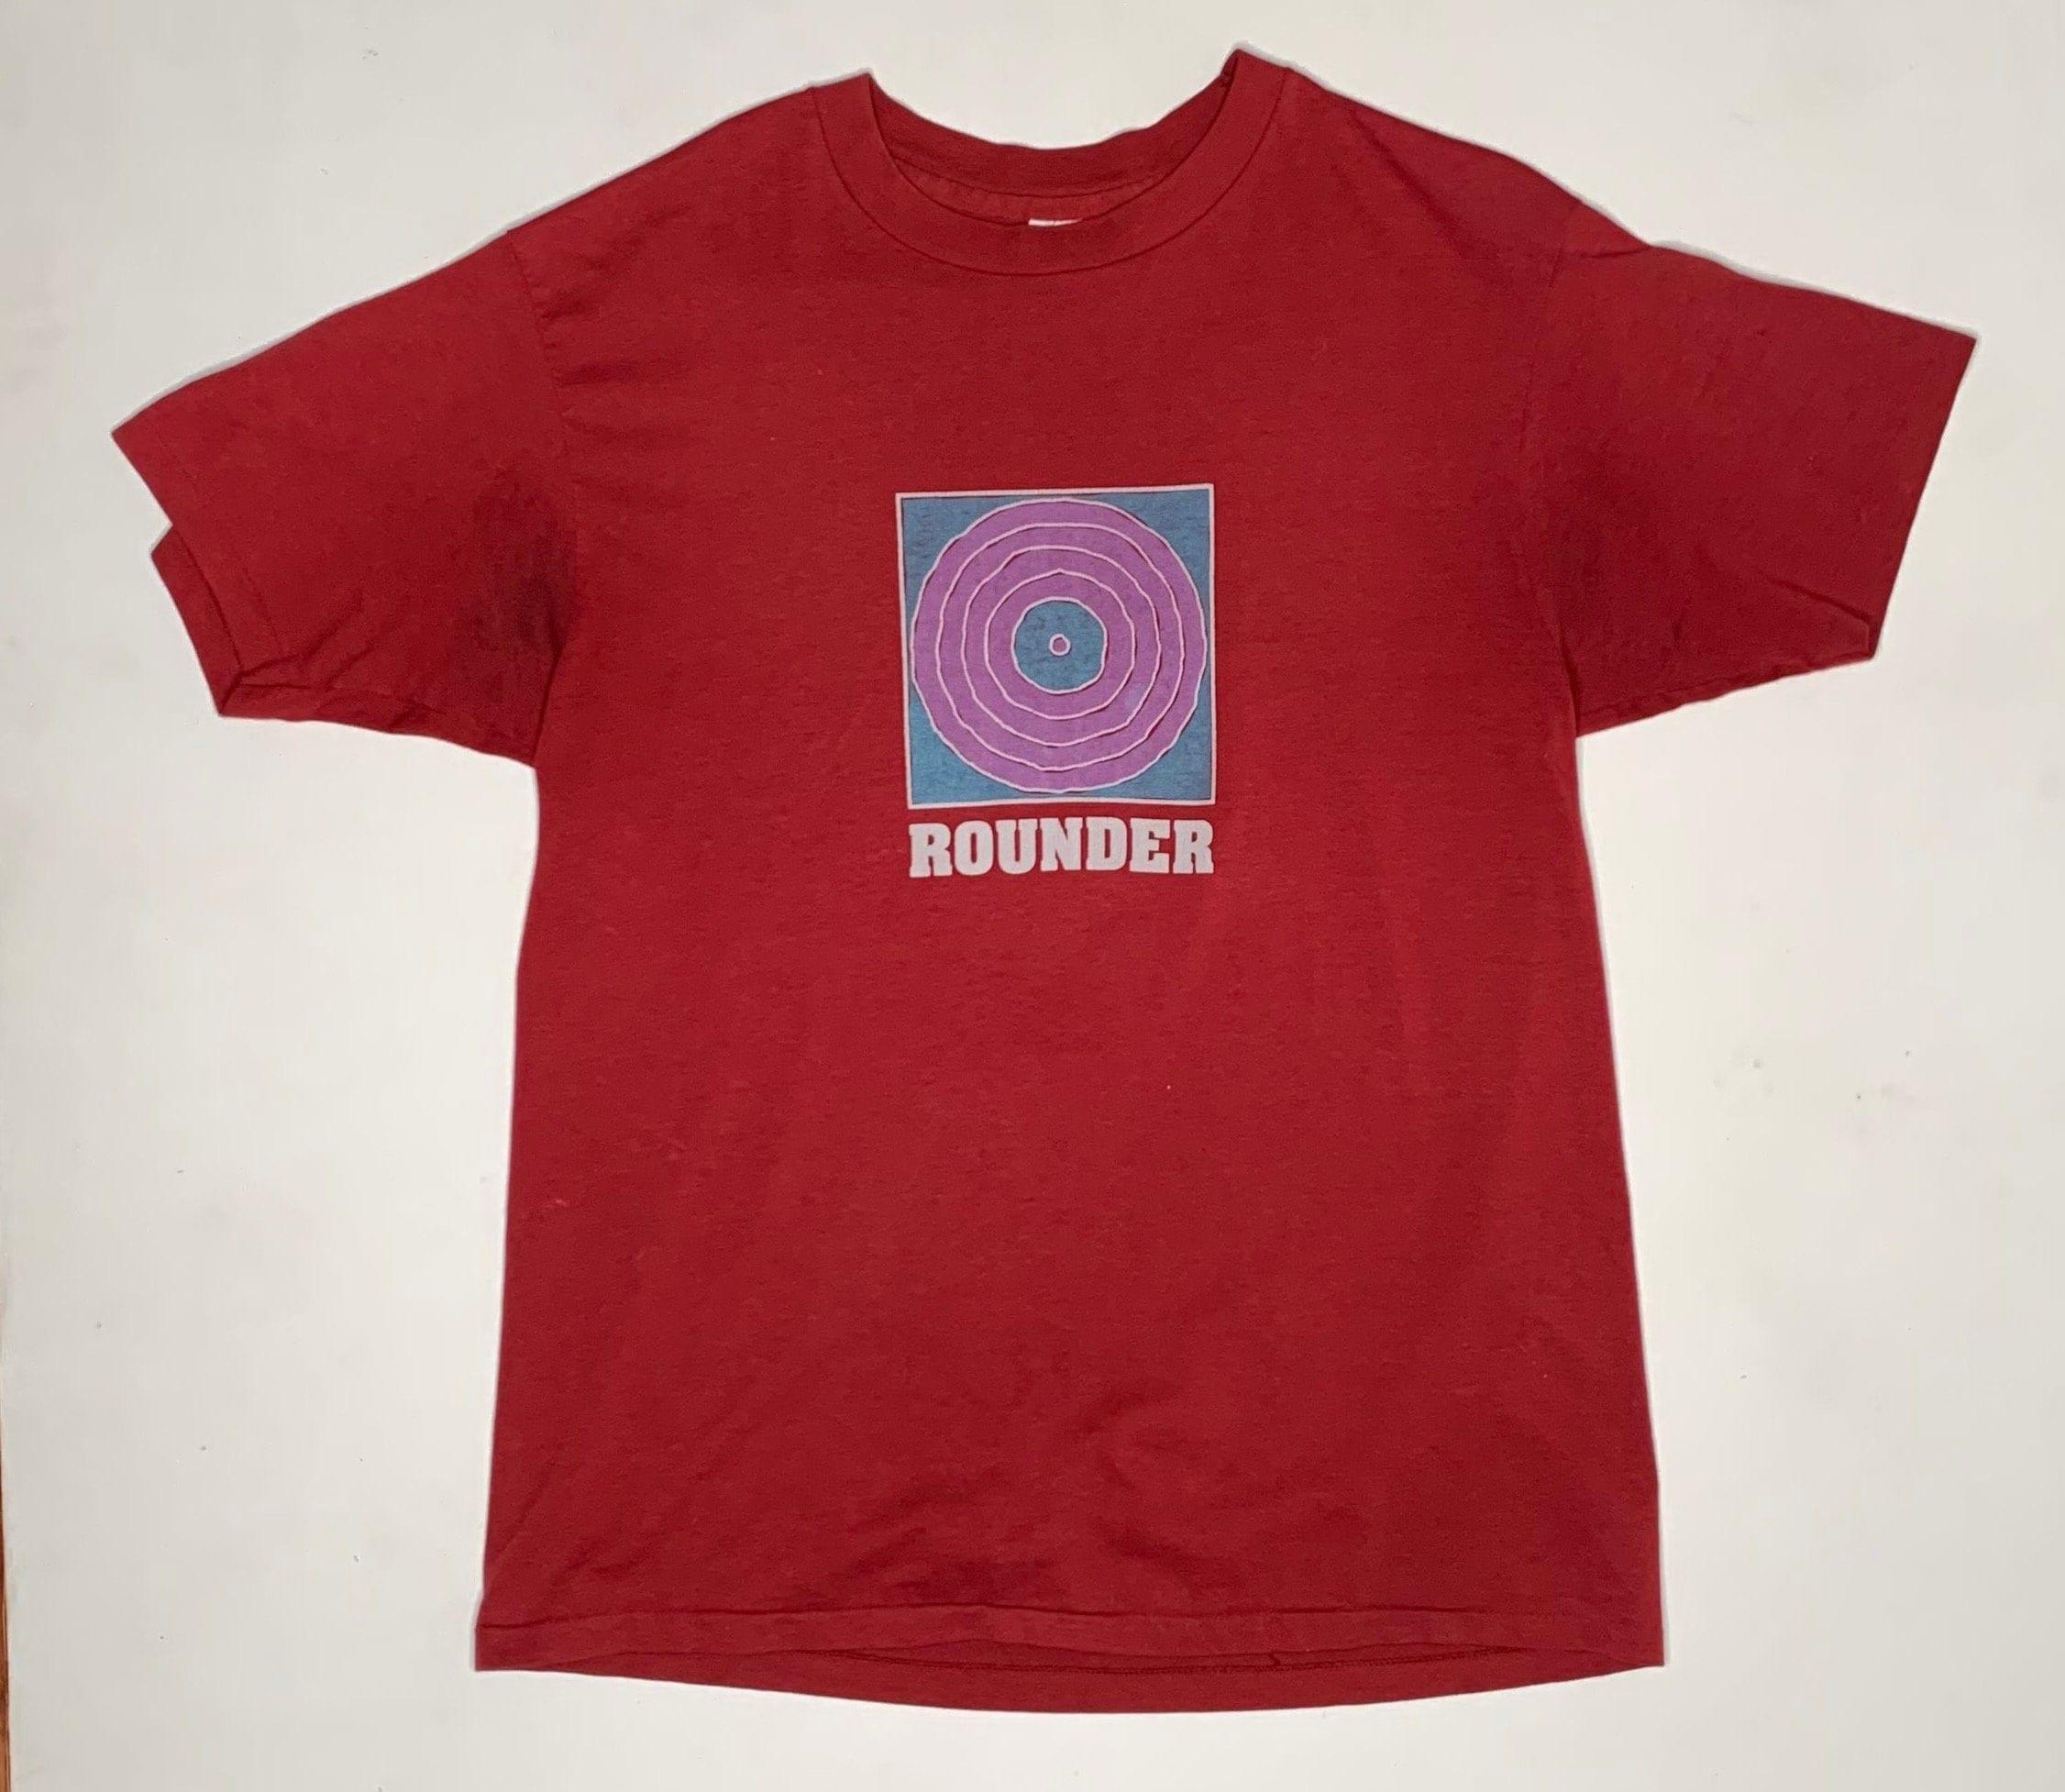 80s Tops, Shirts, T-shirts, Blouse   90s T-shirts 1980s Vintage Rounder Records Label Promo Shirt Xl $120.00 AT vintagedancer.com